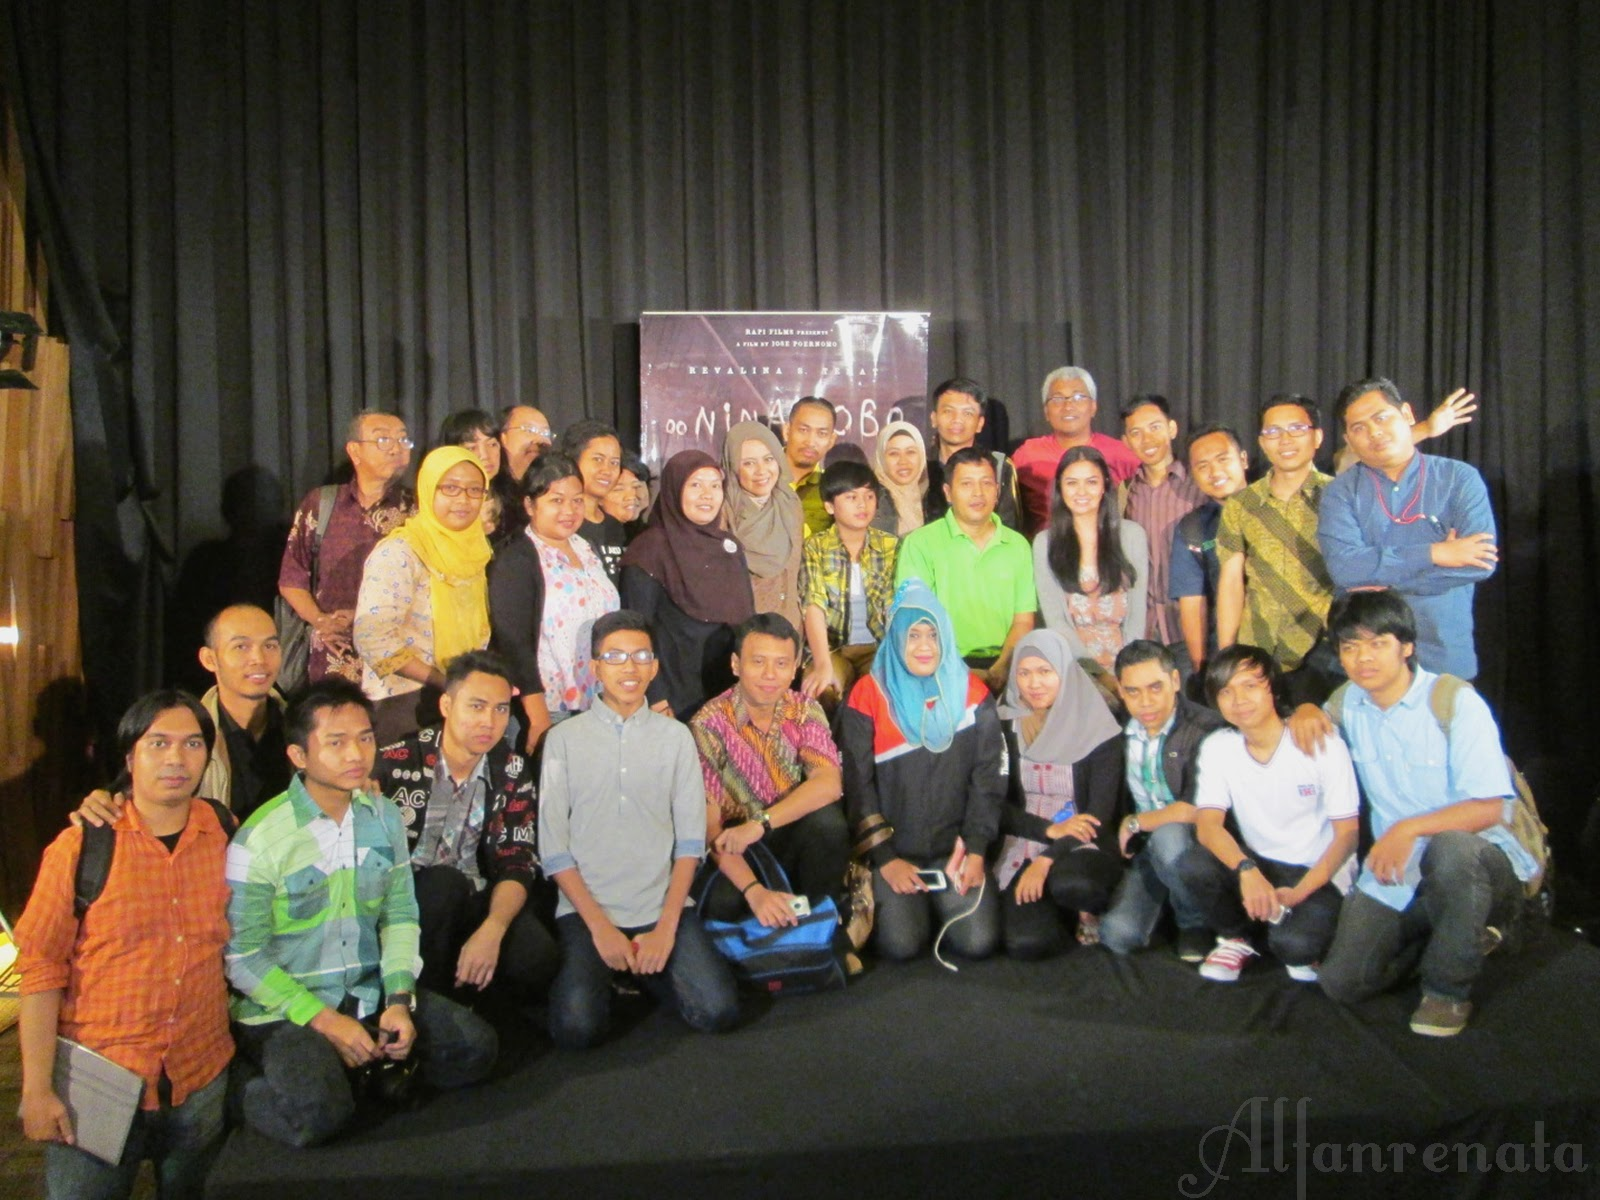 Foto bersama blogger dan artis oo..nina bobo